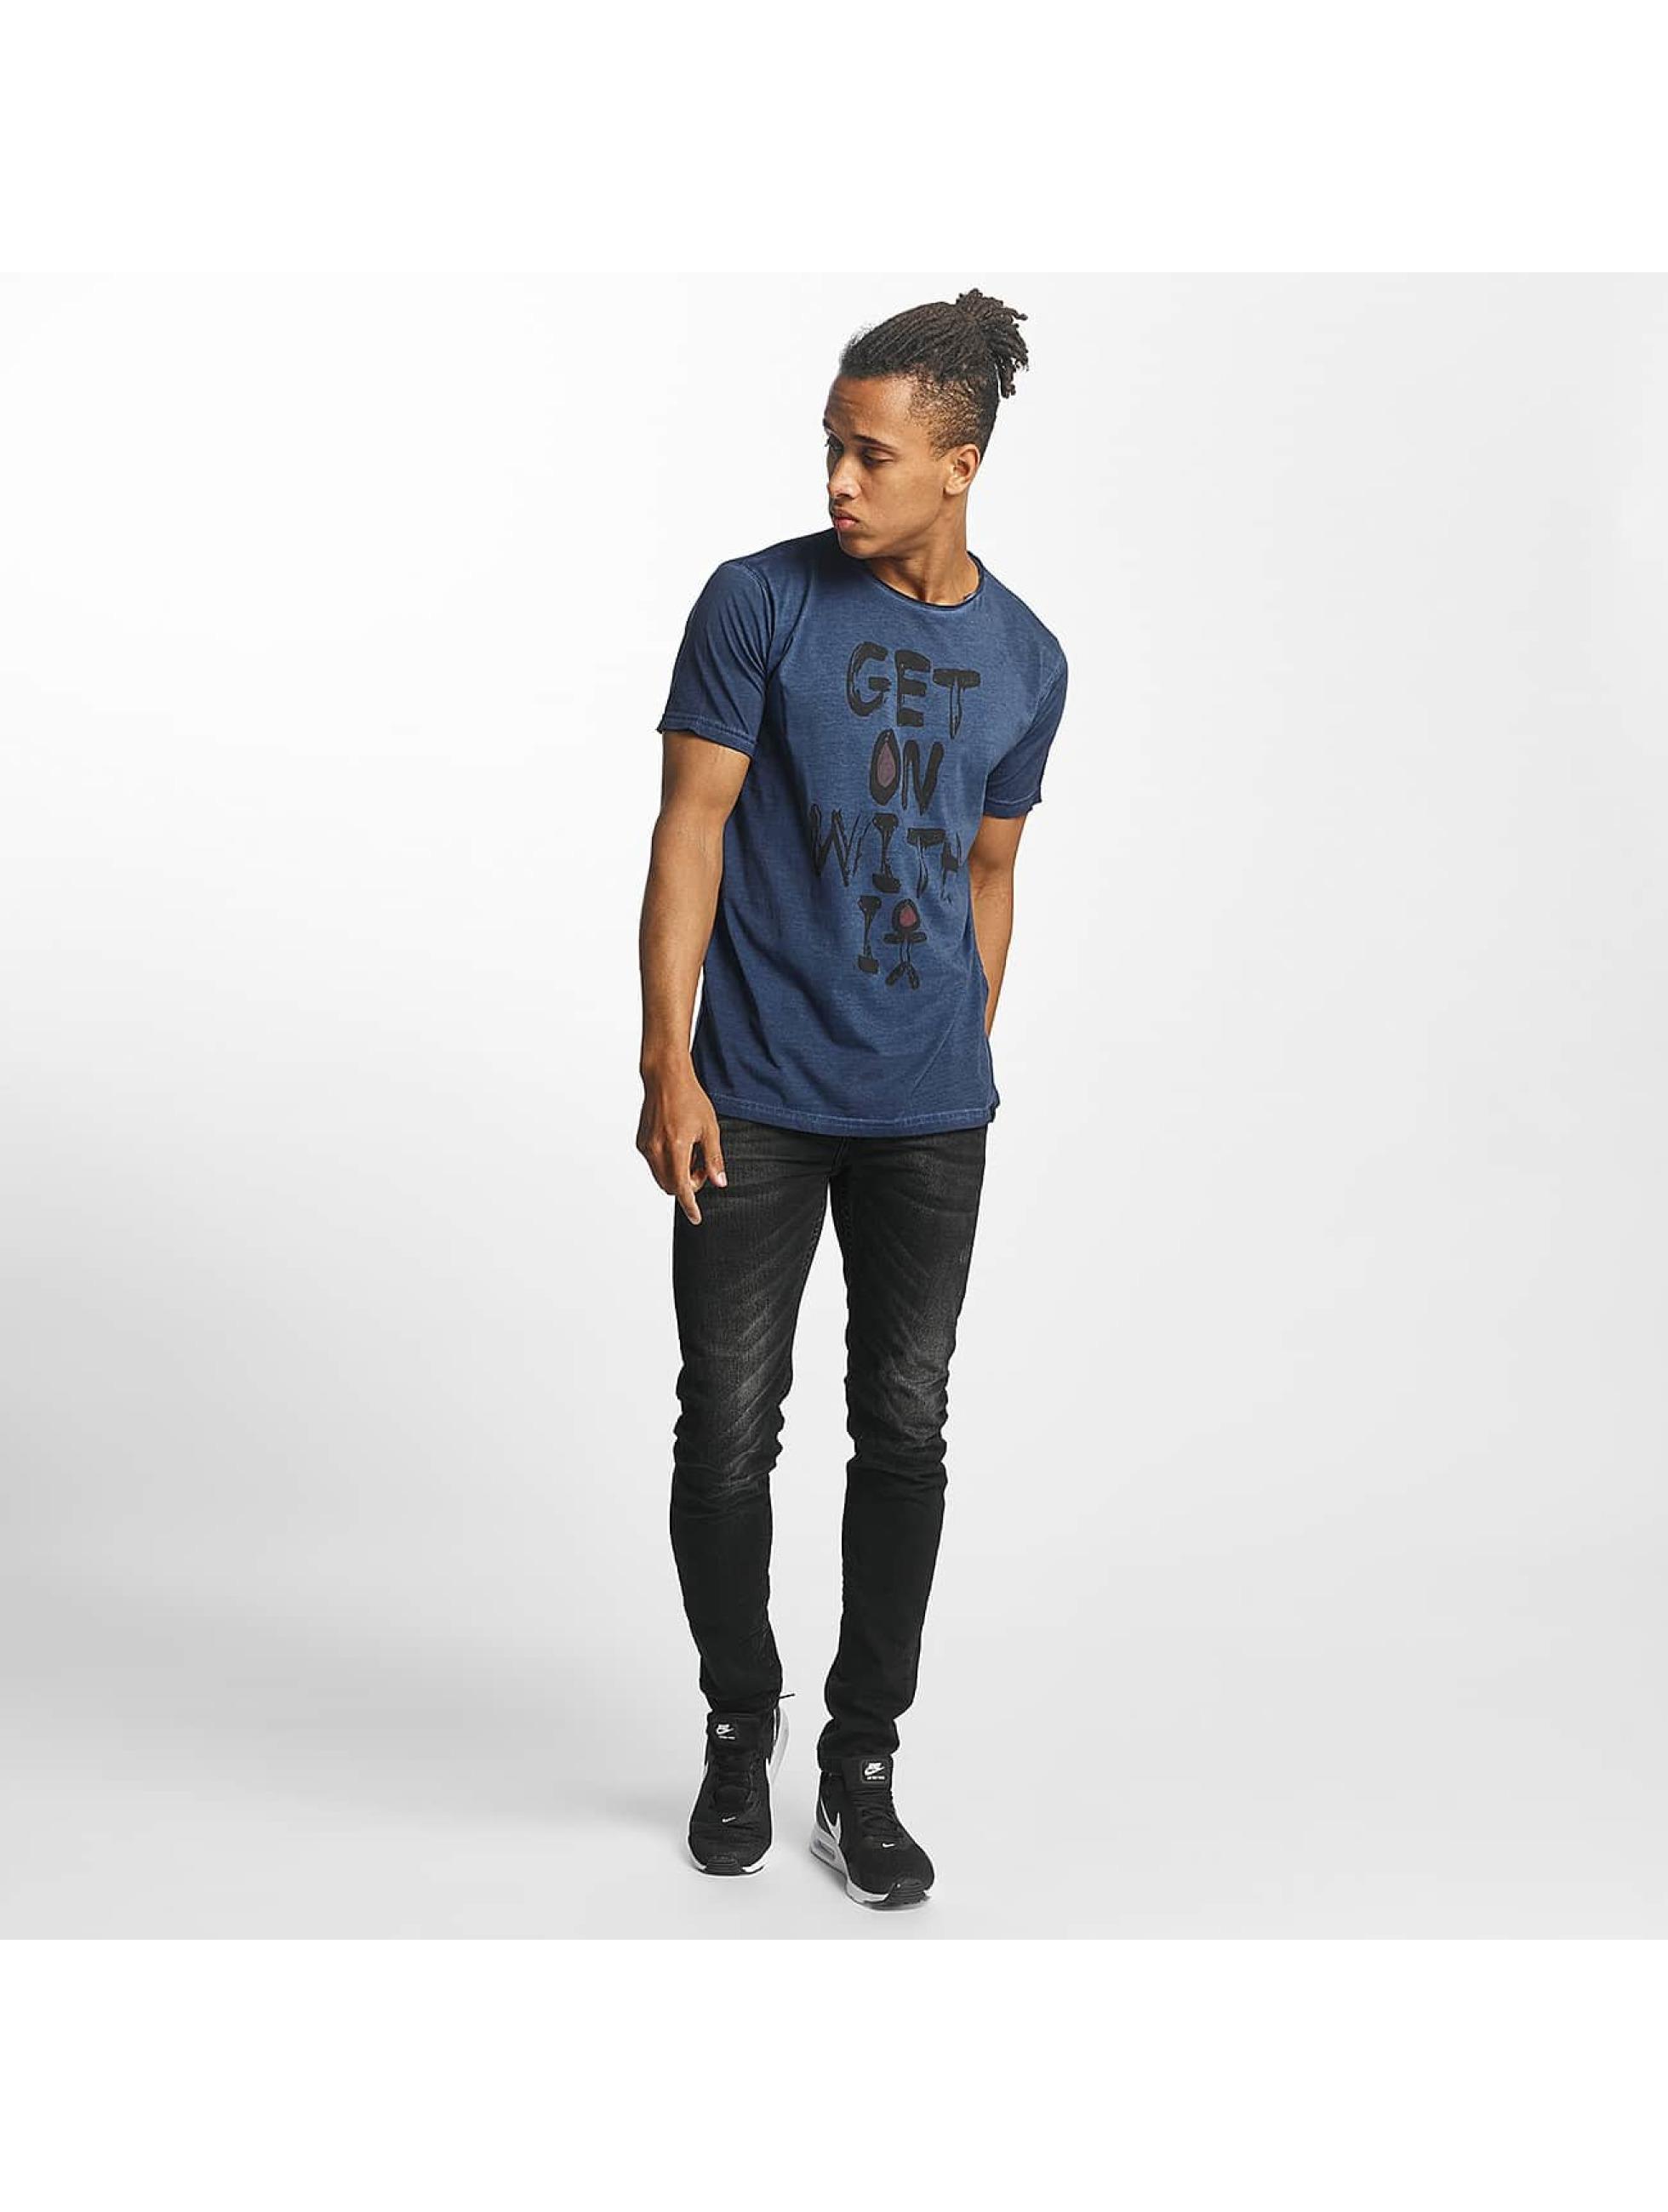 Paris Premium T-Shirt Get on with it bleu